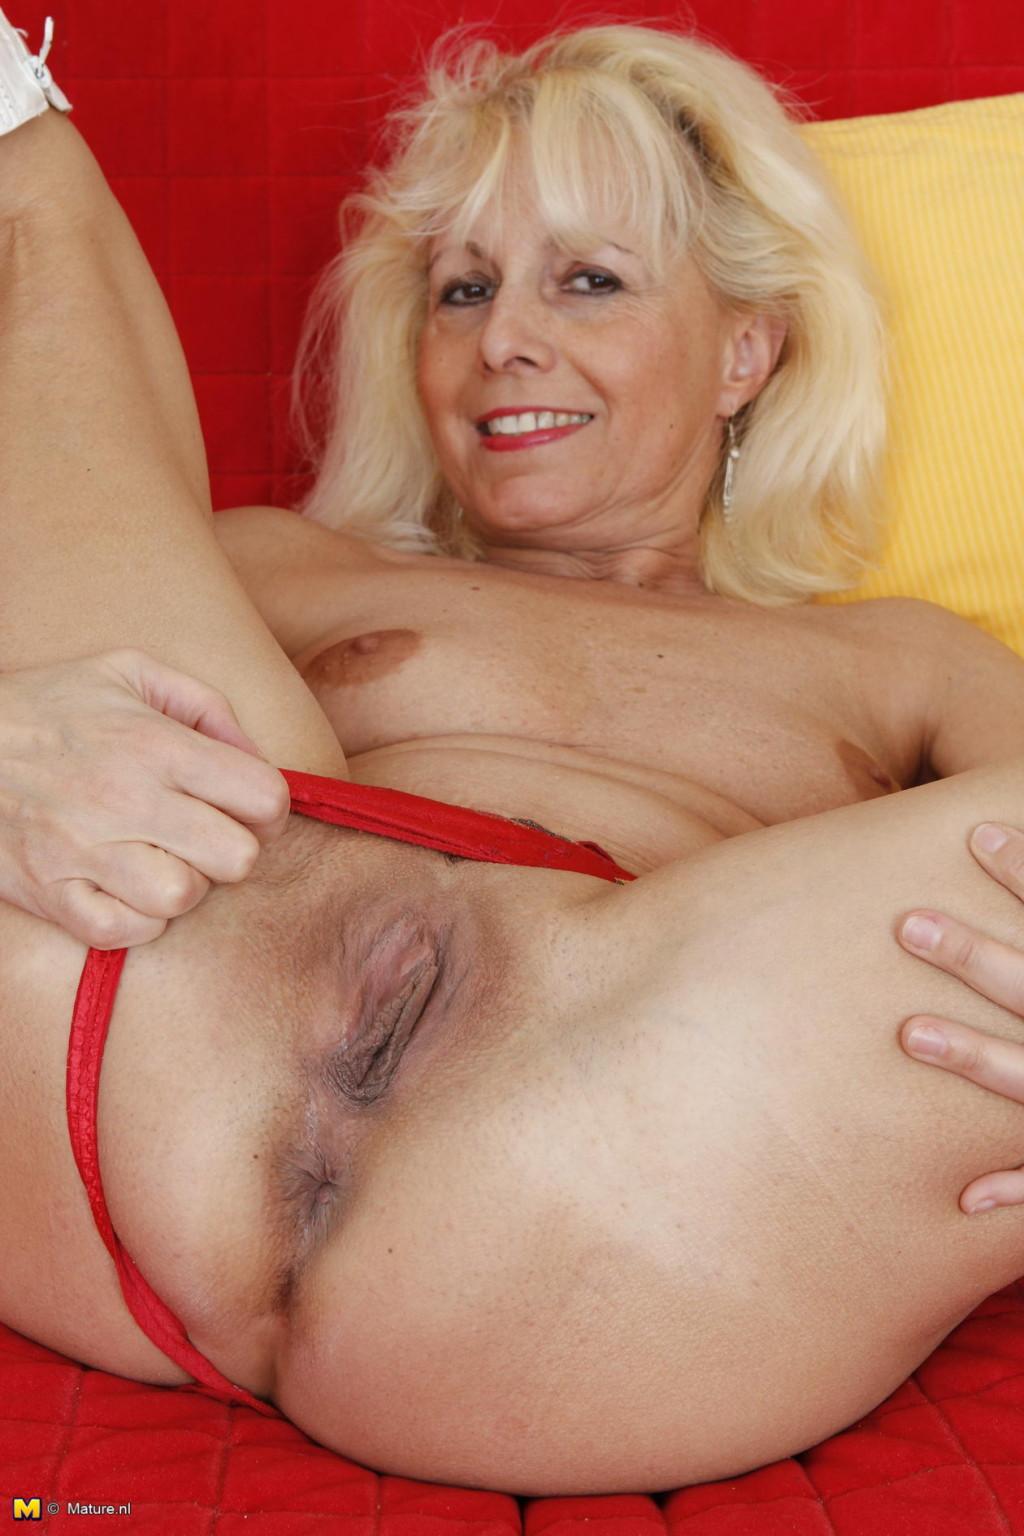 Зрелая женщина - Порно галерея № 3549199